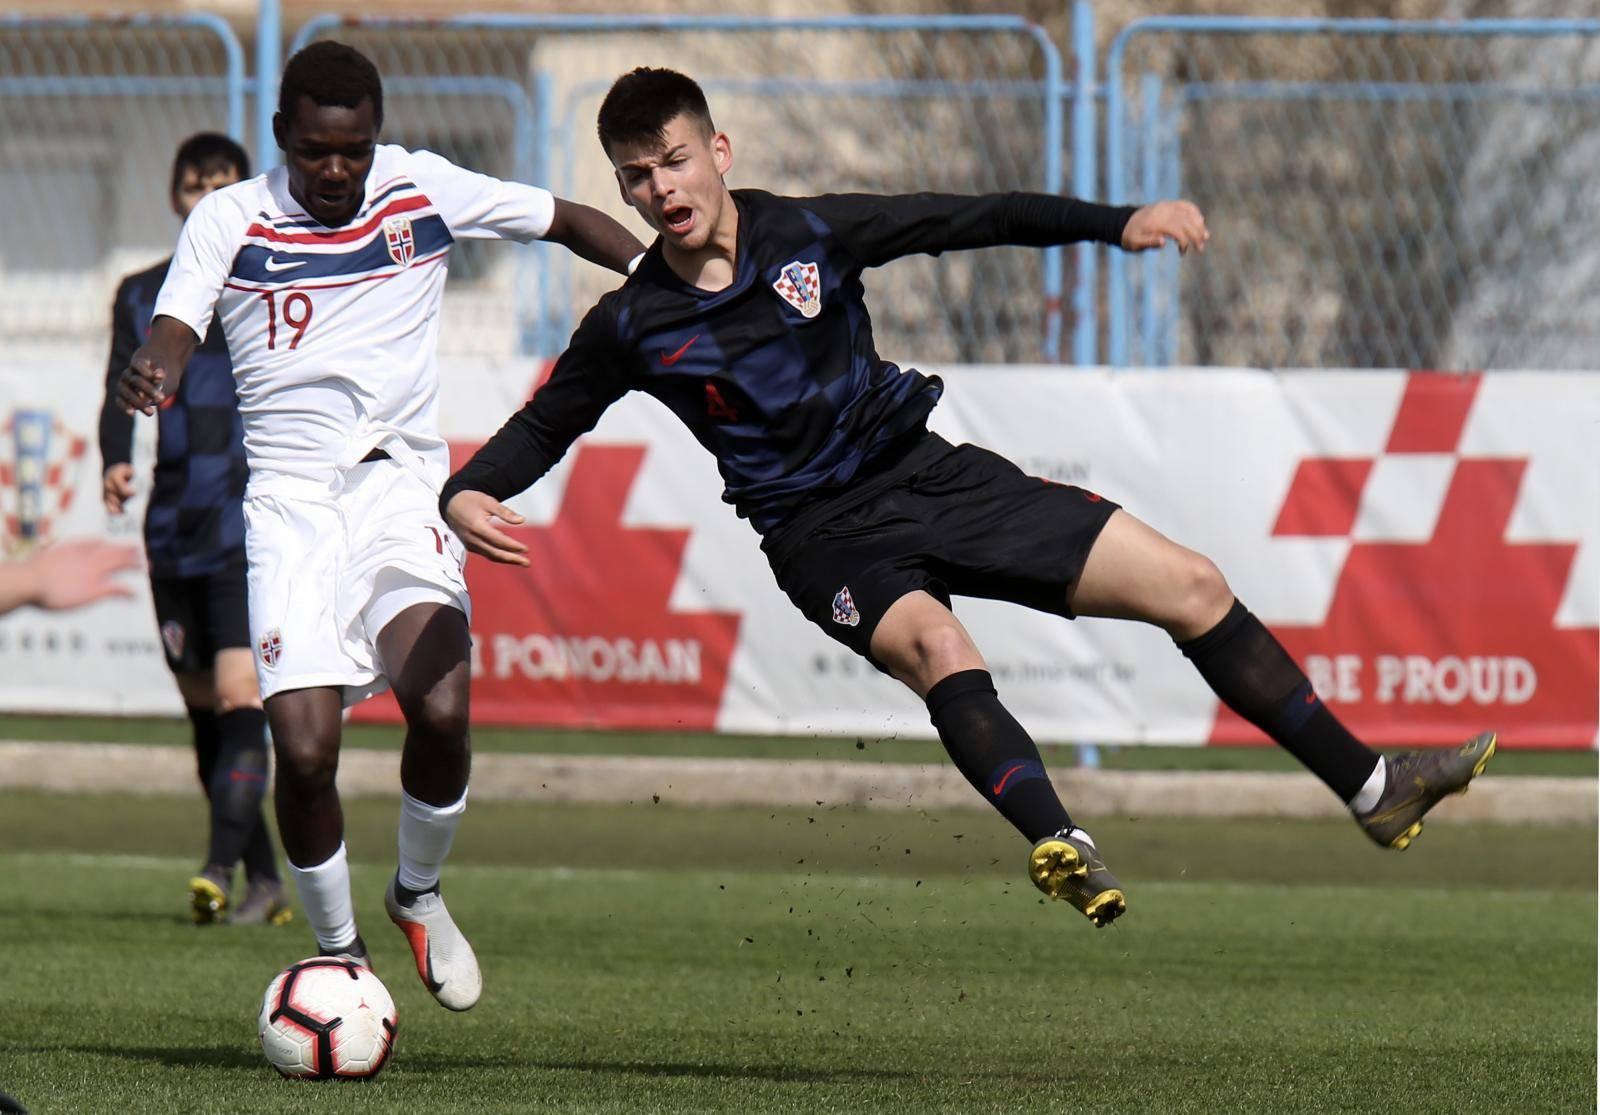 Hrvatska izgubila od Norveške i ne ide na Europsko prvenstvo